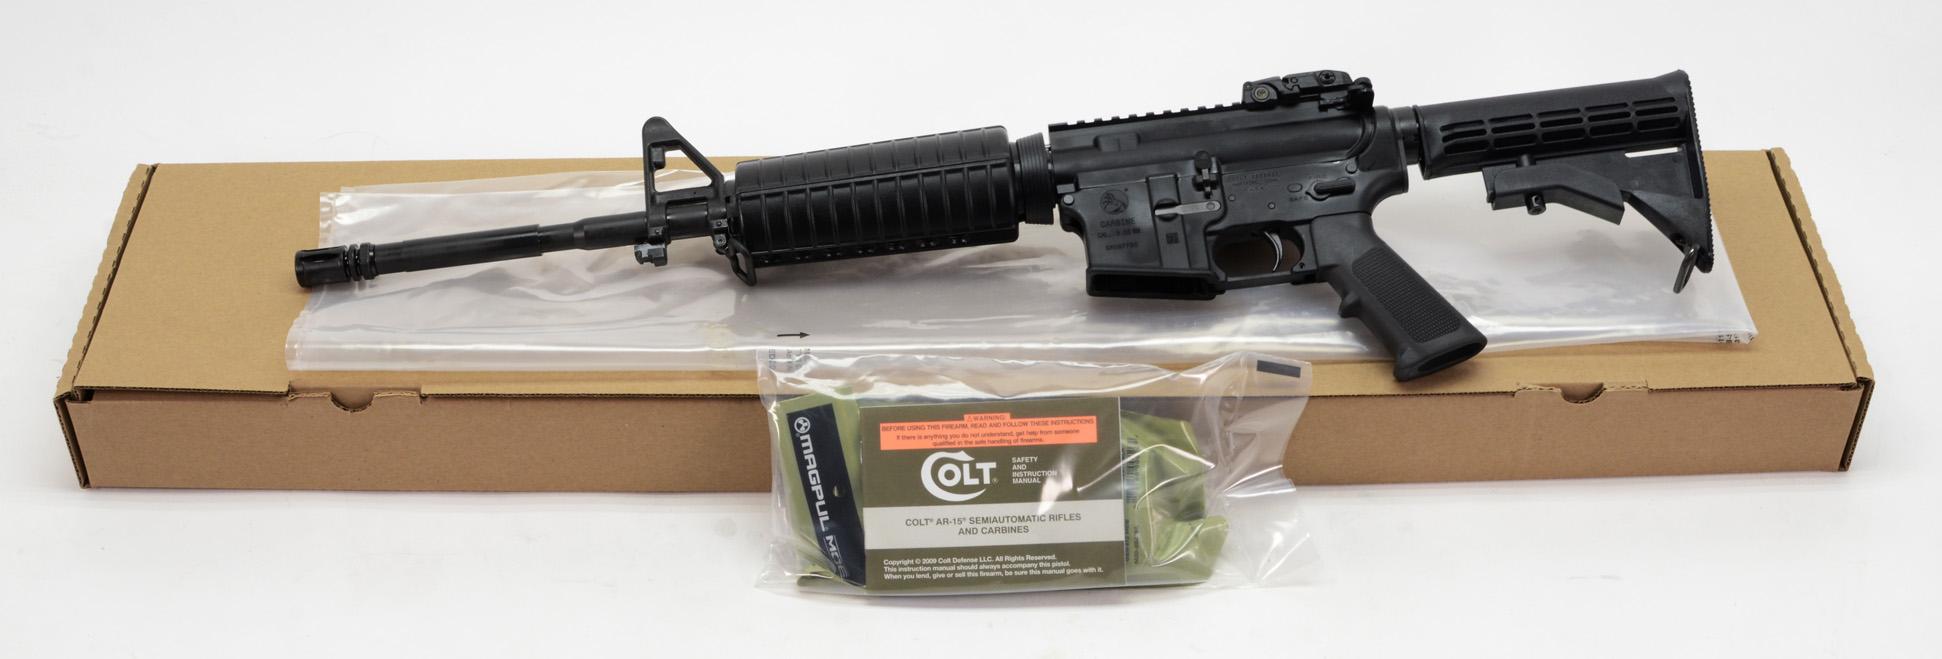 Colt Carbine CR6920